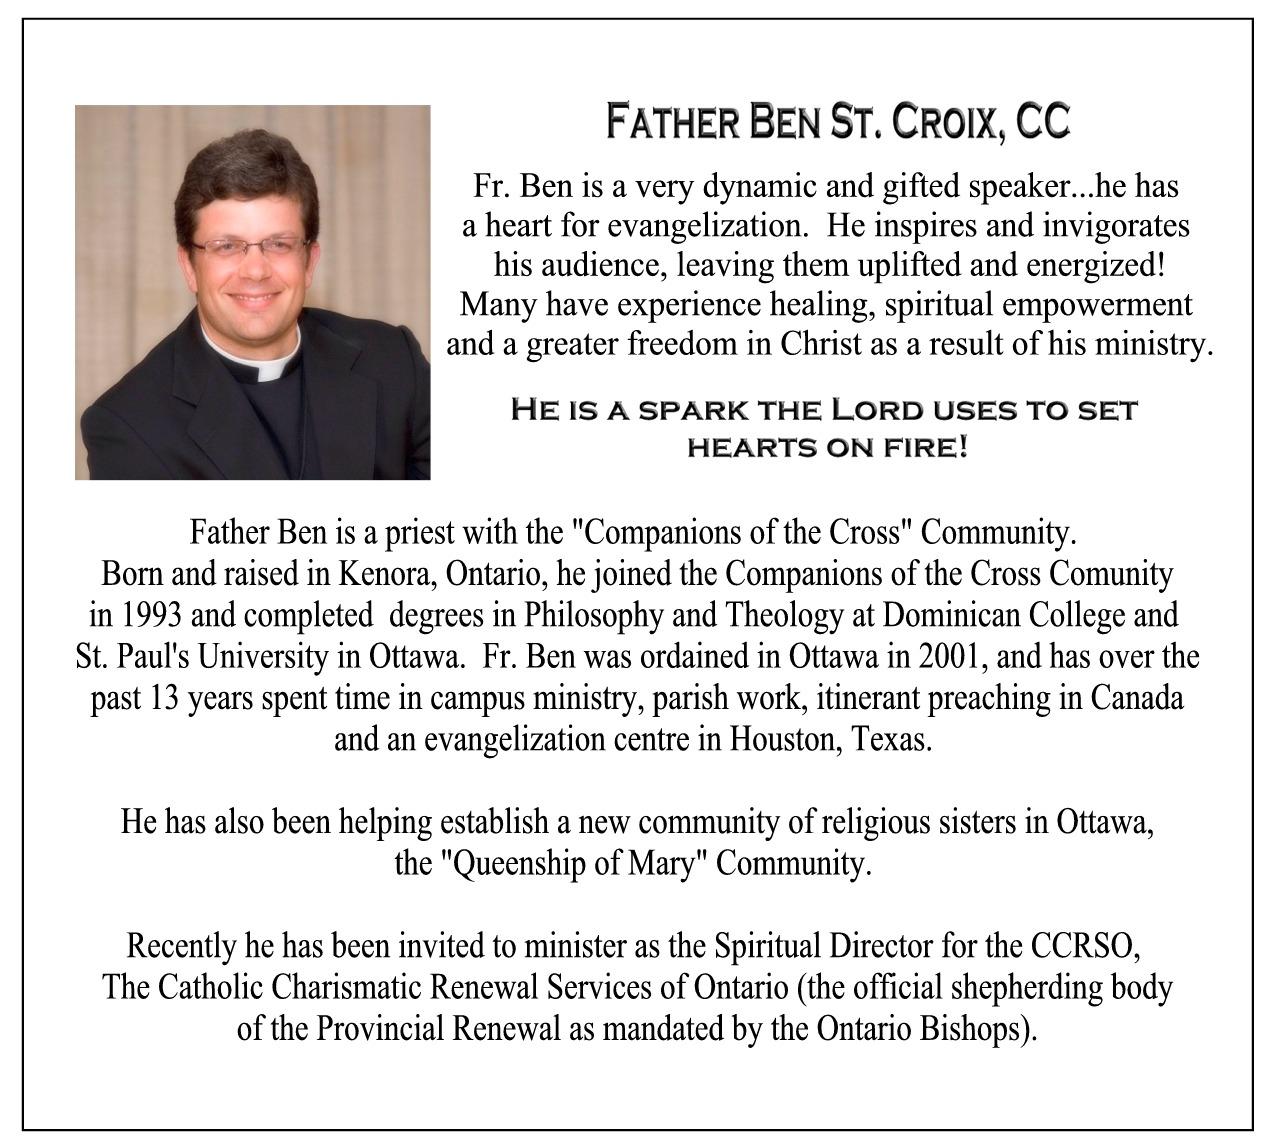 bio-father-ben-st-croix-cc